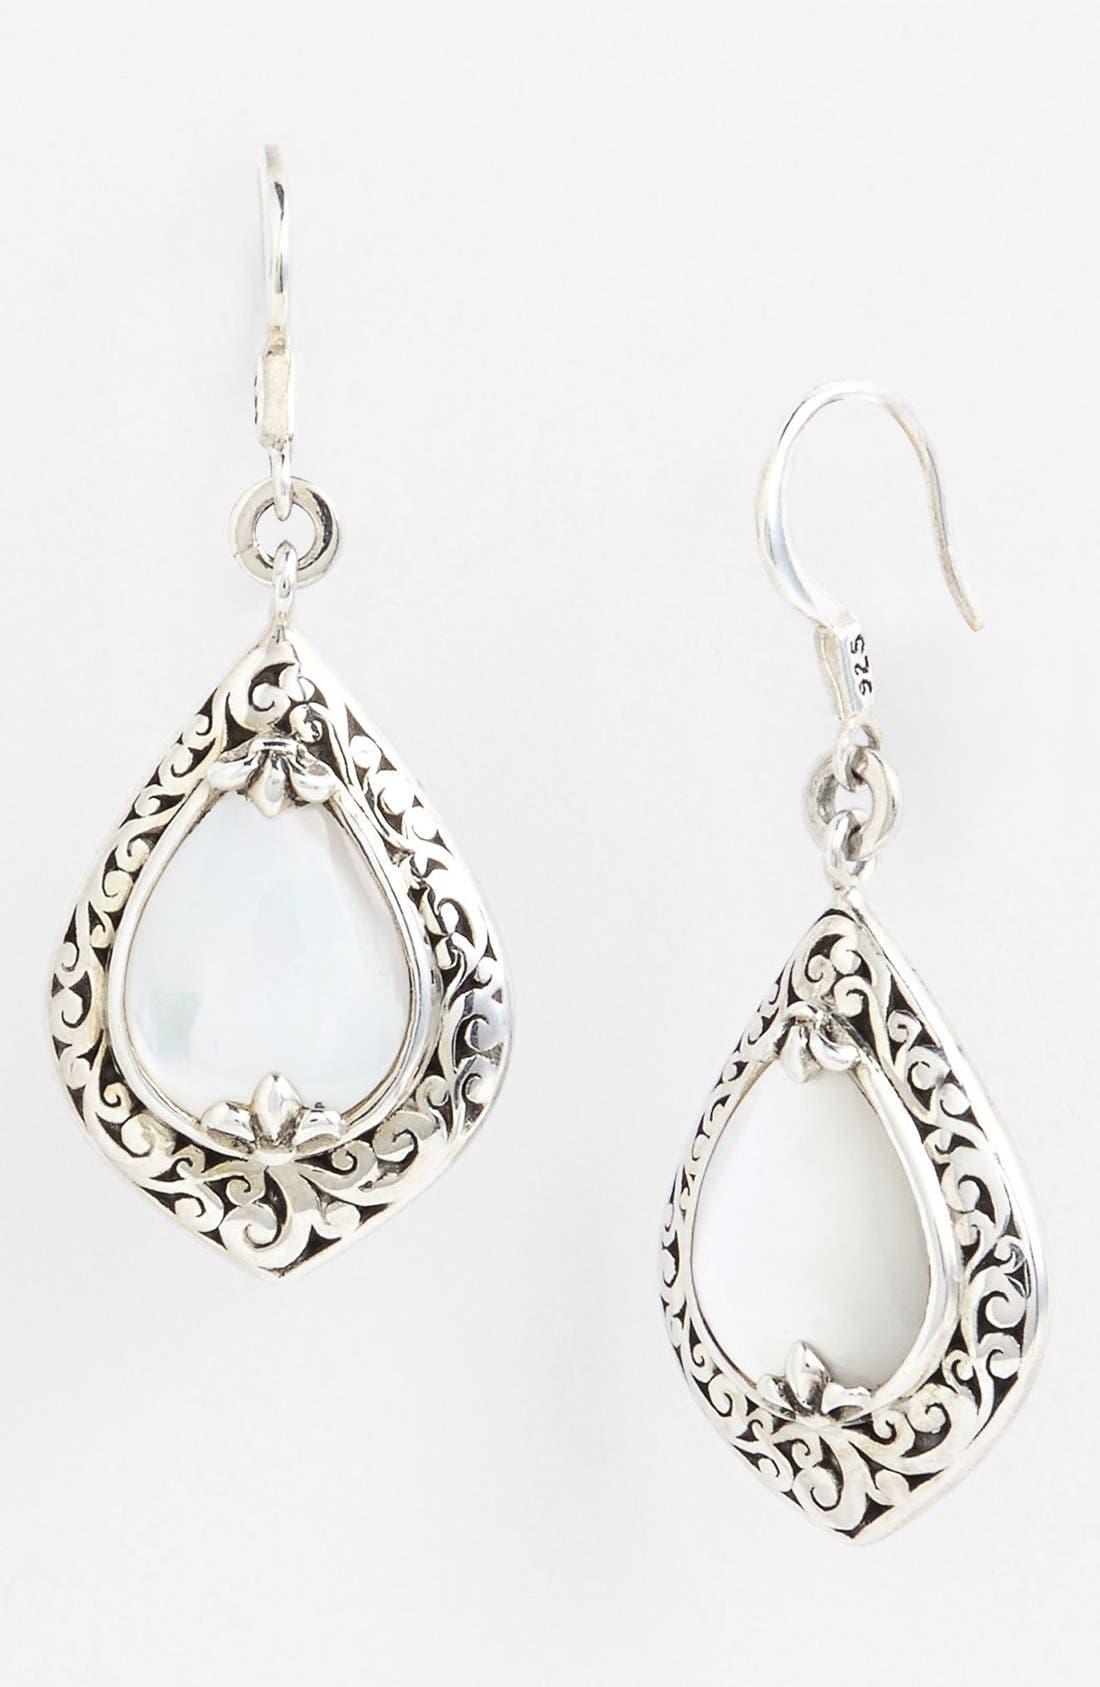 Alternate Image 1 Selected - Lois Hill Medium Mother-of-Pearl Teardrop Earrings